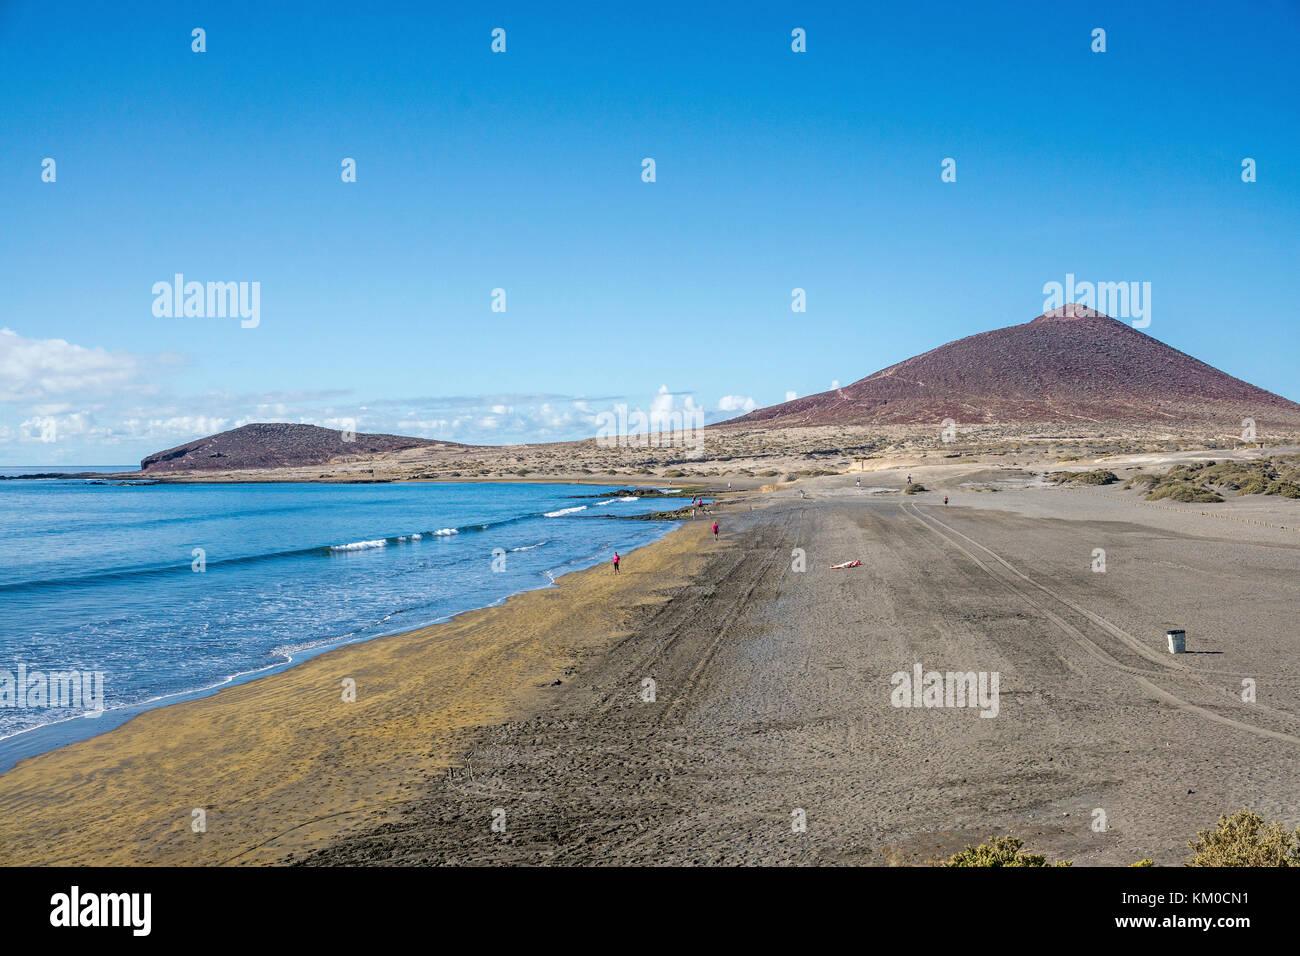 El Medano, popular beach for surfers and Montana Roja, Tenerife island, Canary islands, Spain - Stock Image